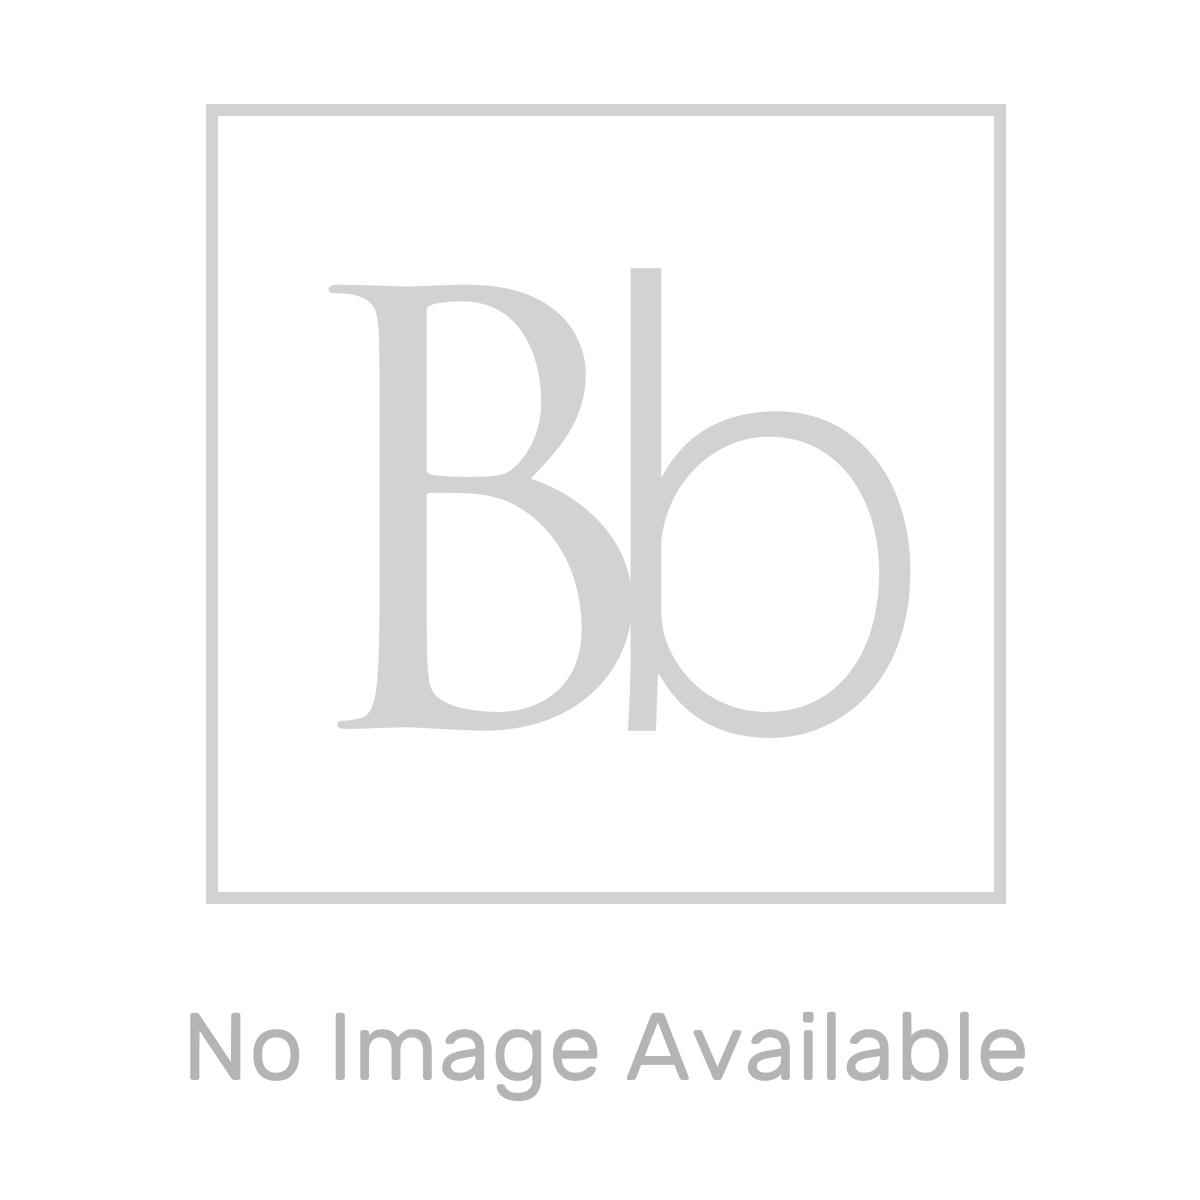 HiB Jazz Heated Bathroom Mirror